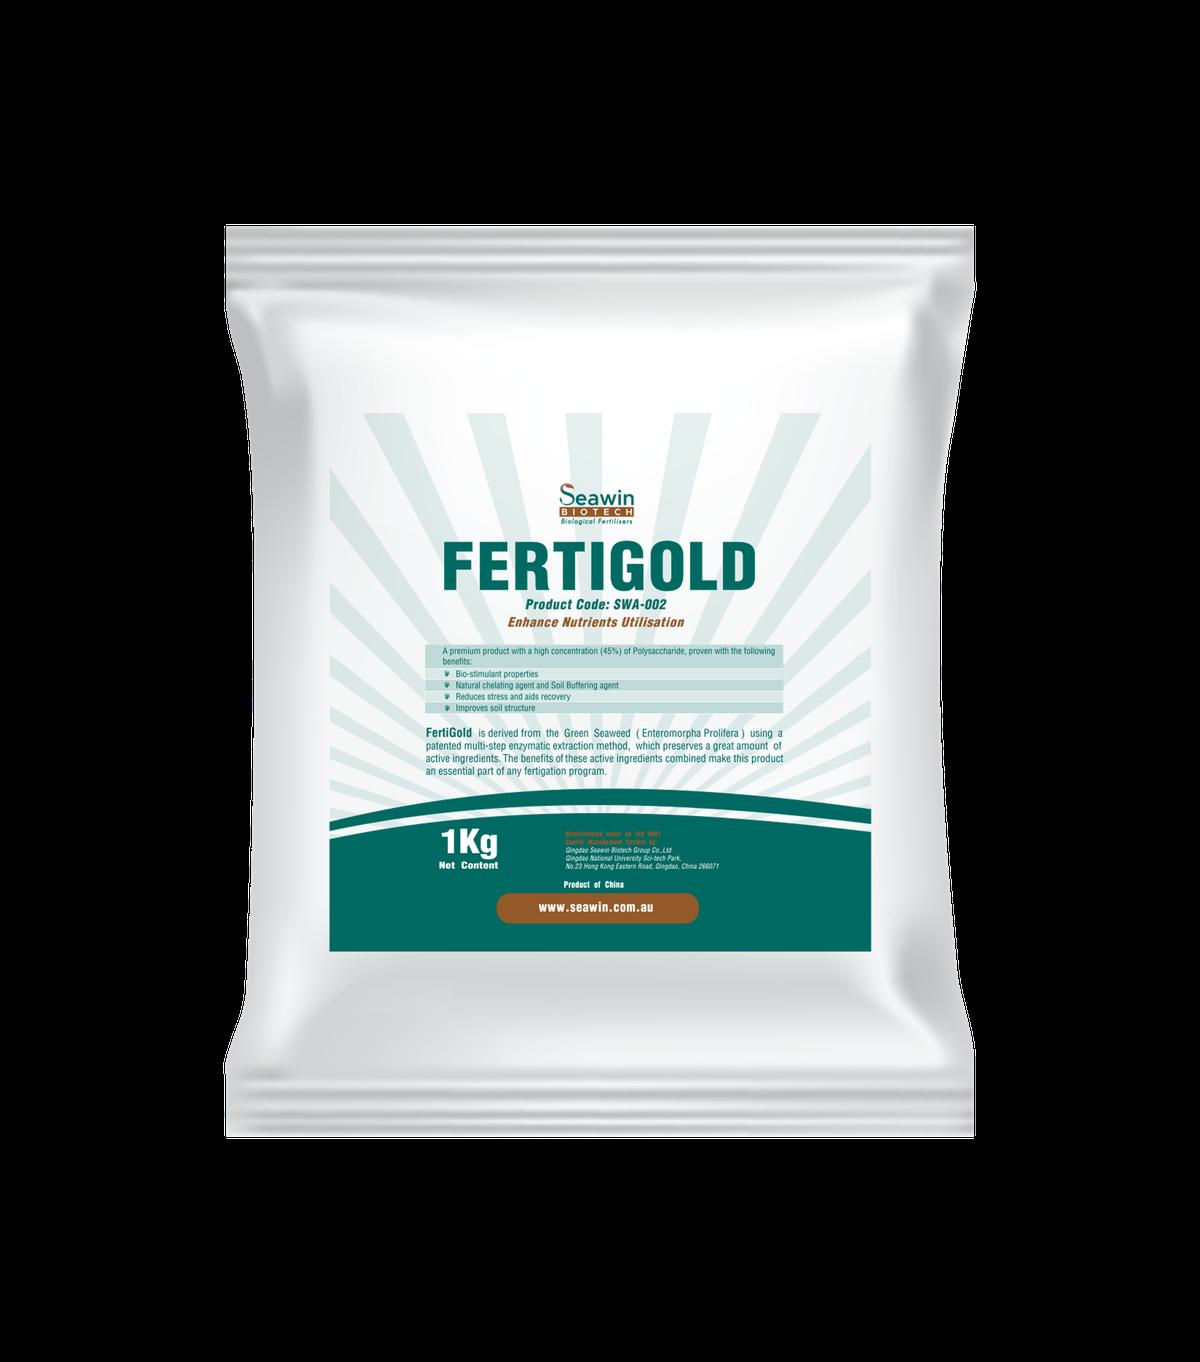 Design a Packaging for a fertiliser Product!